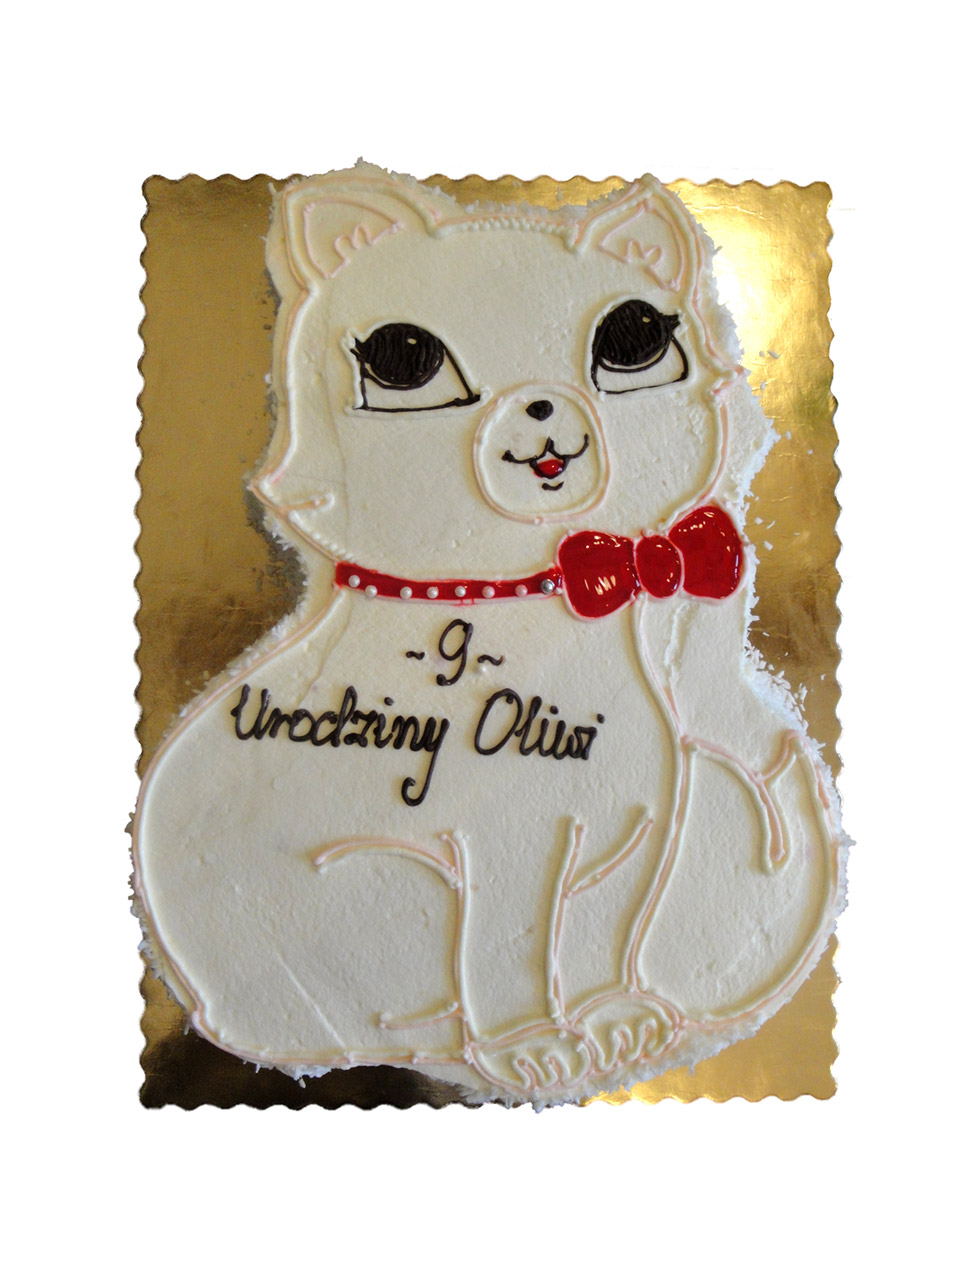 Tort Kot Nr2 Cukiernia Ciacholandia Torty I Ciasta Złotoryja